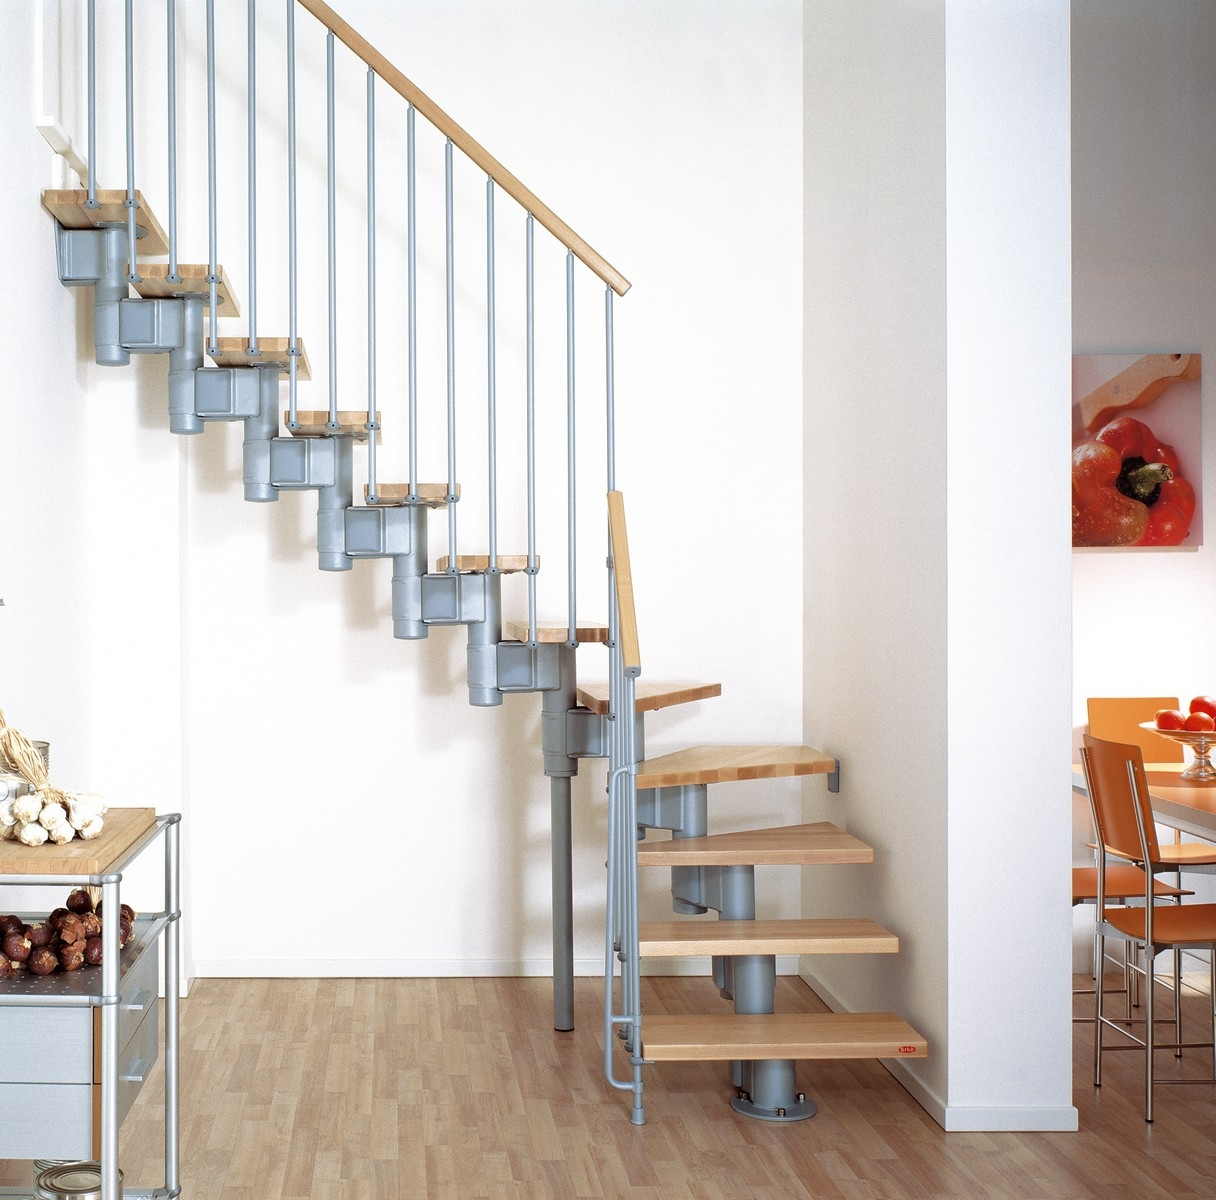 Kompact Adjustable Staircase Kit Metal Steel And Wood Spiral   5 Foot Spiral Staircase   Metal   Hayden Gray   Reroute Galvanized   Steel   Handrail